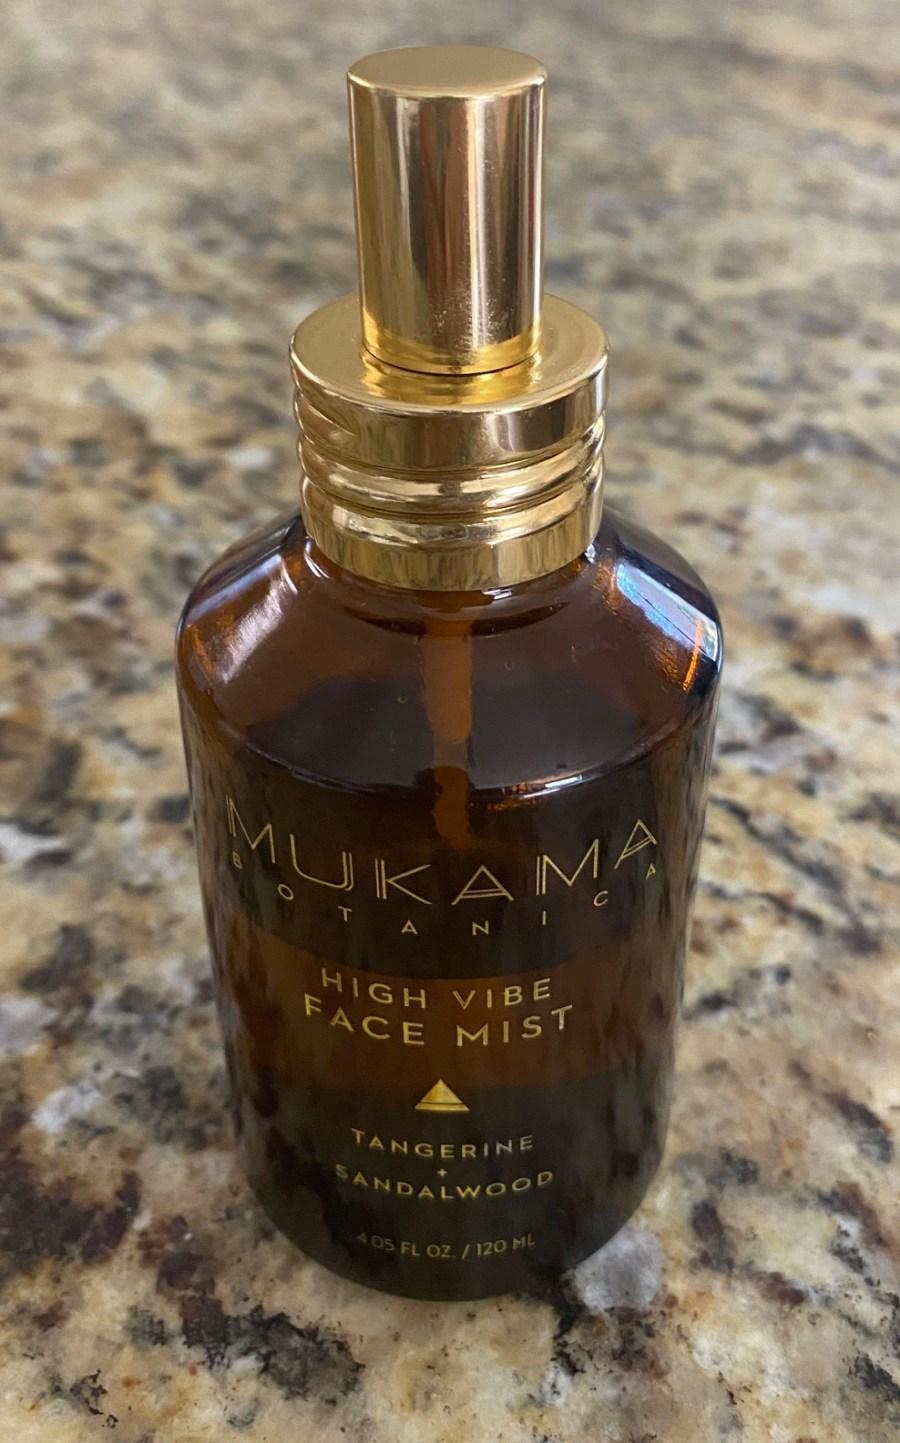 Mukama-Botanica-High-Vibe-Face-Mist-Tangerine-Sandalwood-Product Reviews-Black-Yoga-Instructor-Busy-Yoga-Mother-Blog